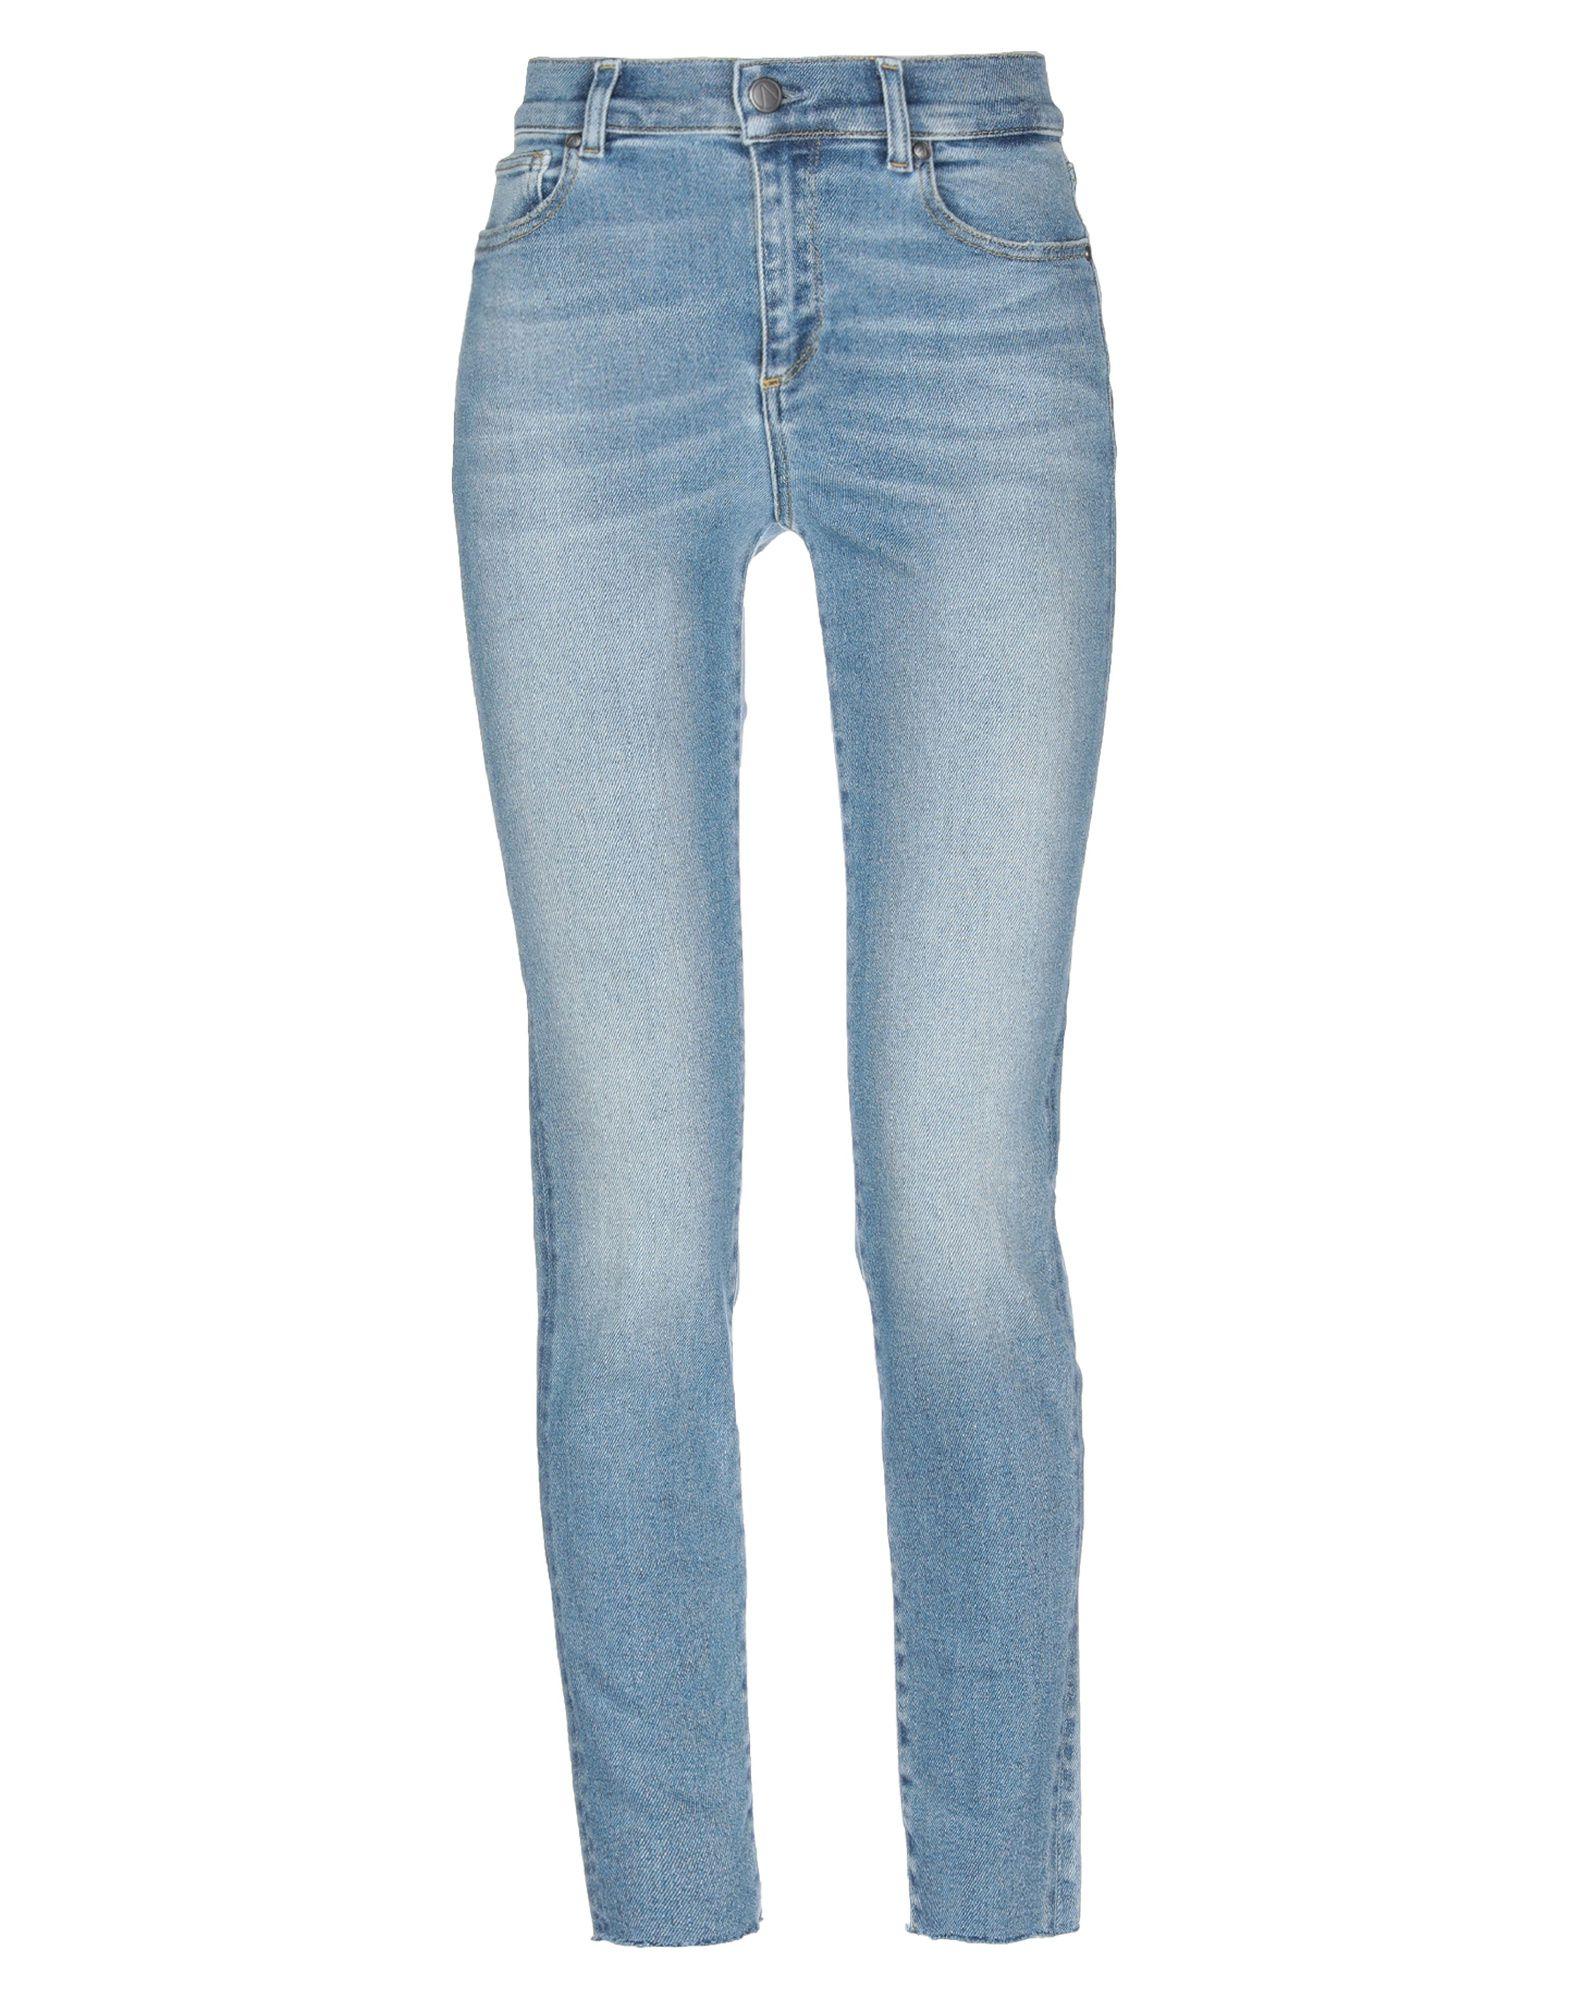 Pantaloni Jeans Acynetic donna - 42727921RF 42727921RF 42727921RF 32a